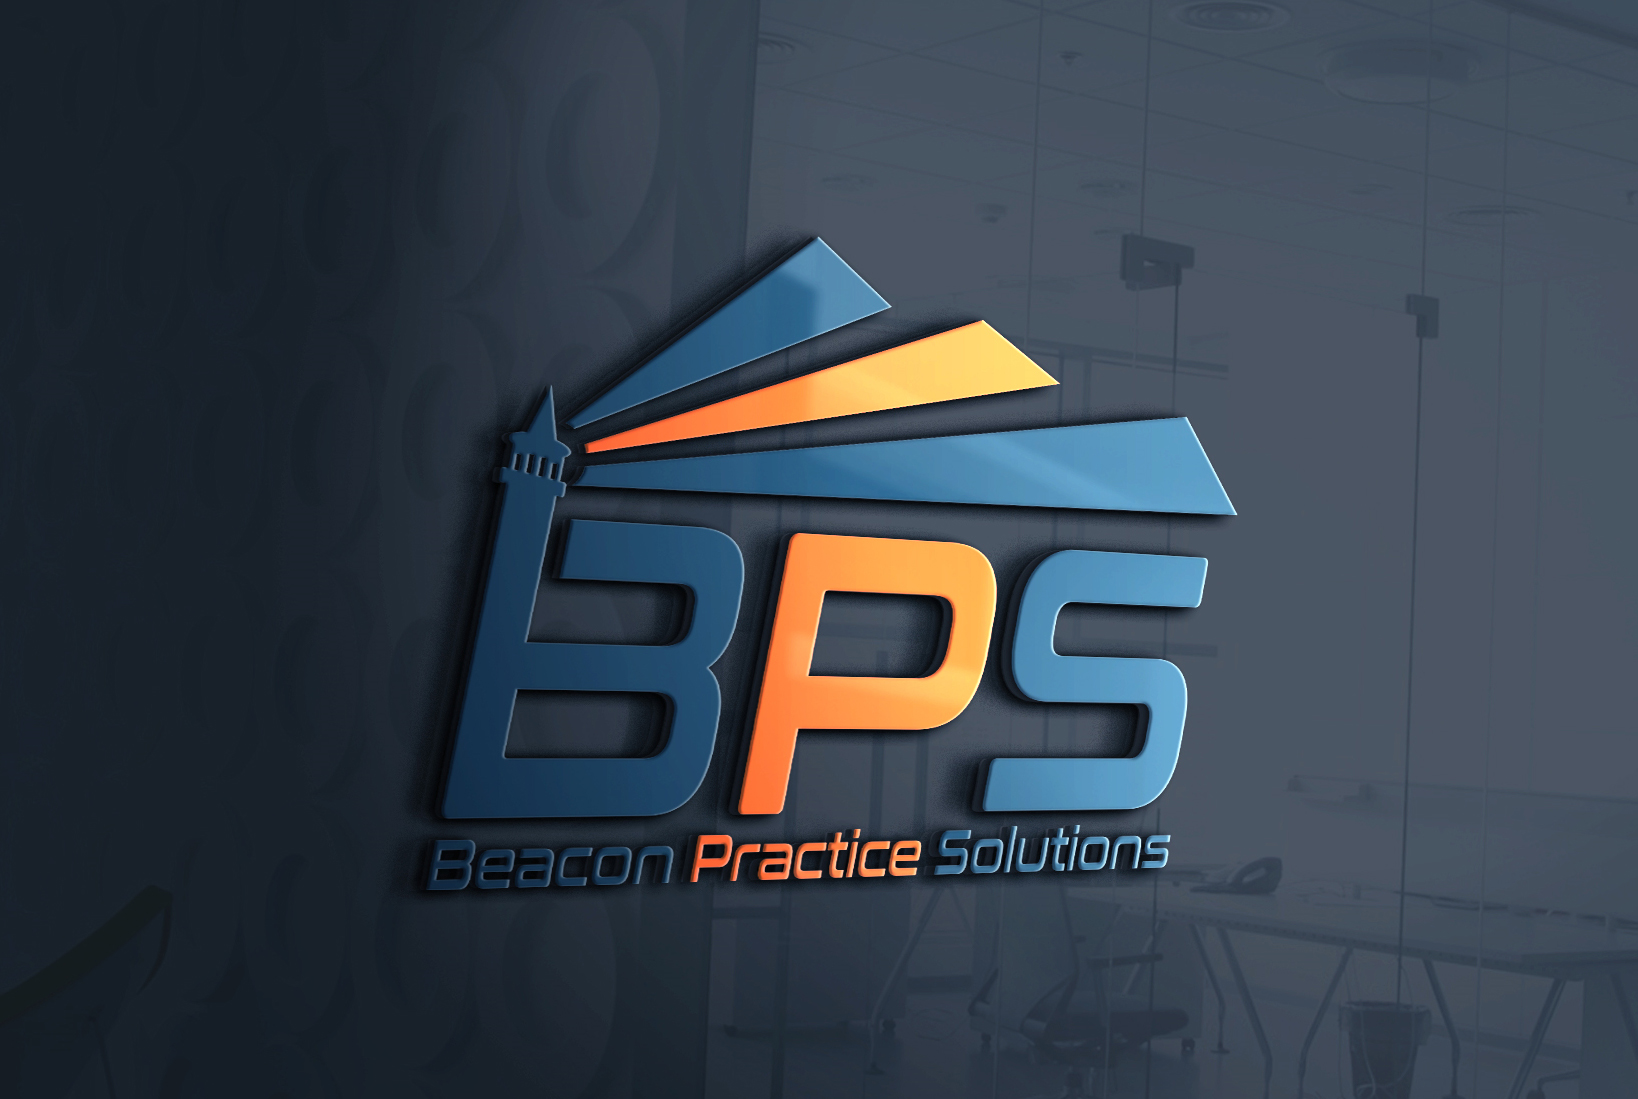 Design a unique professional logo design for your company or business